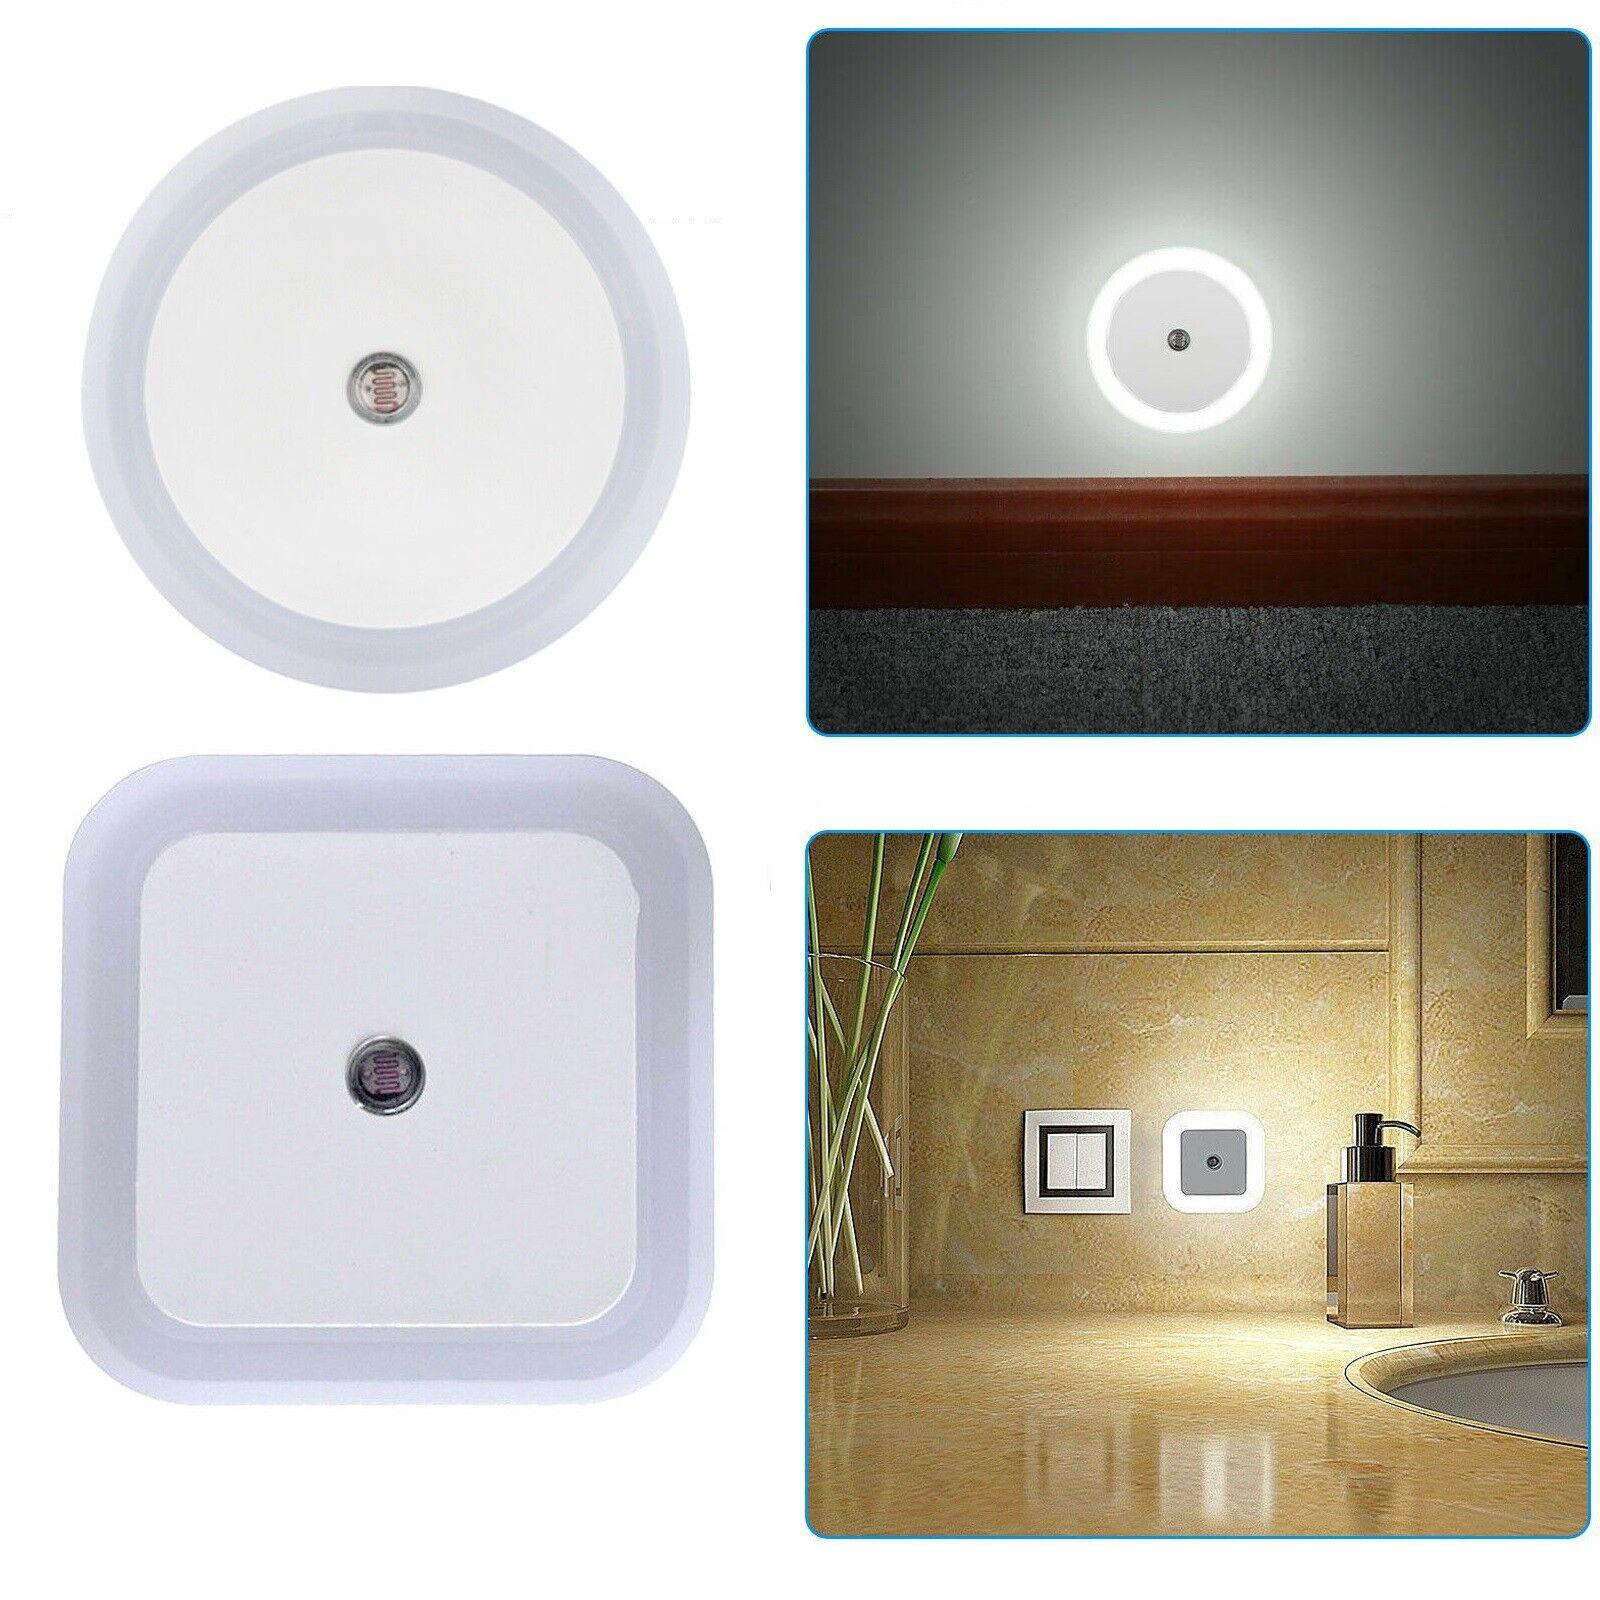 Plug-In LED Night Light Lamp with Ambient Light Sensor Dusk to Dawn Sensor 0.5W Home & Garden